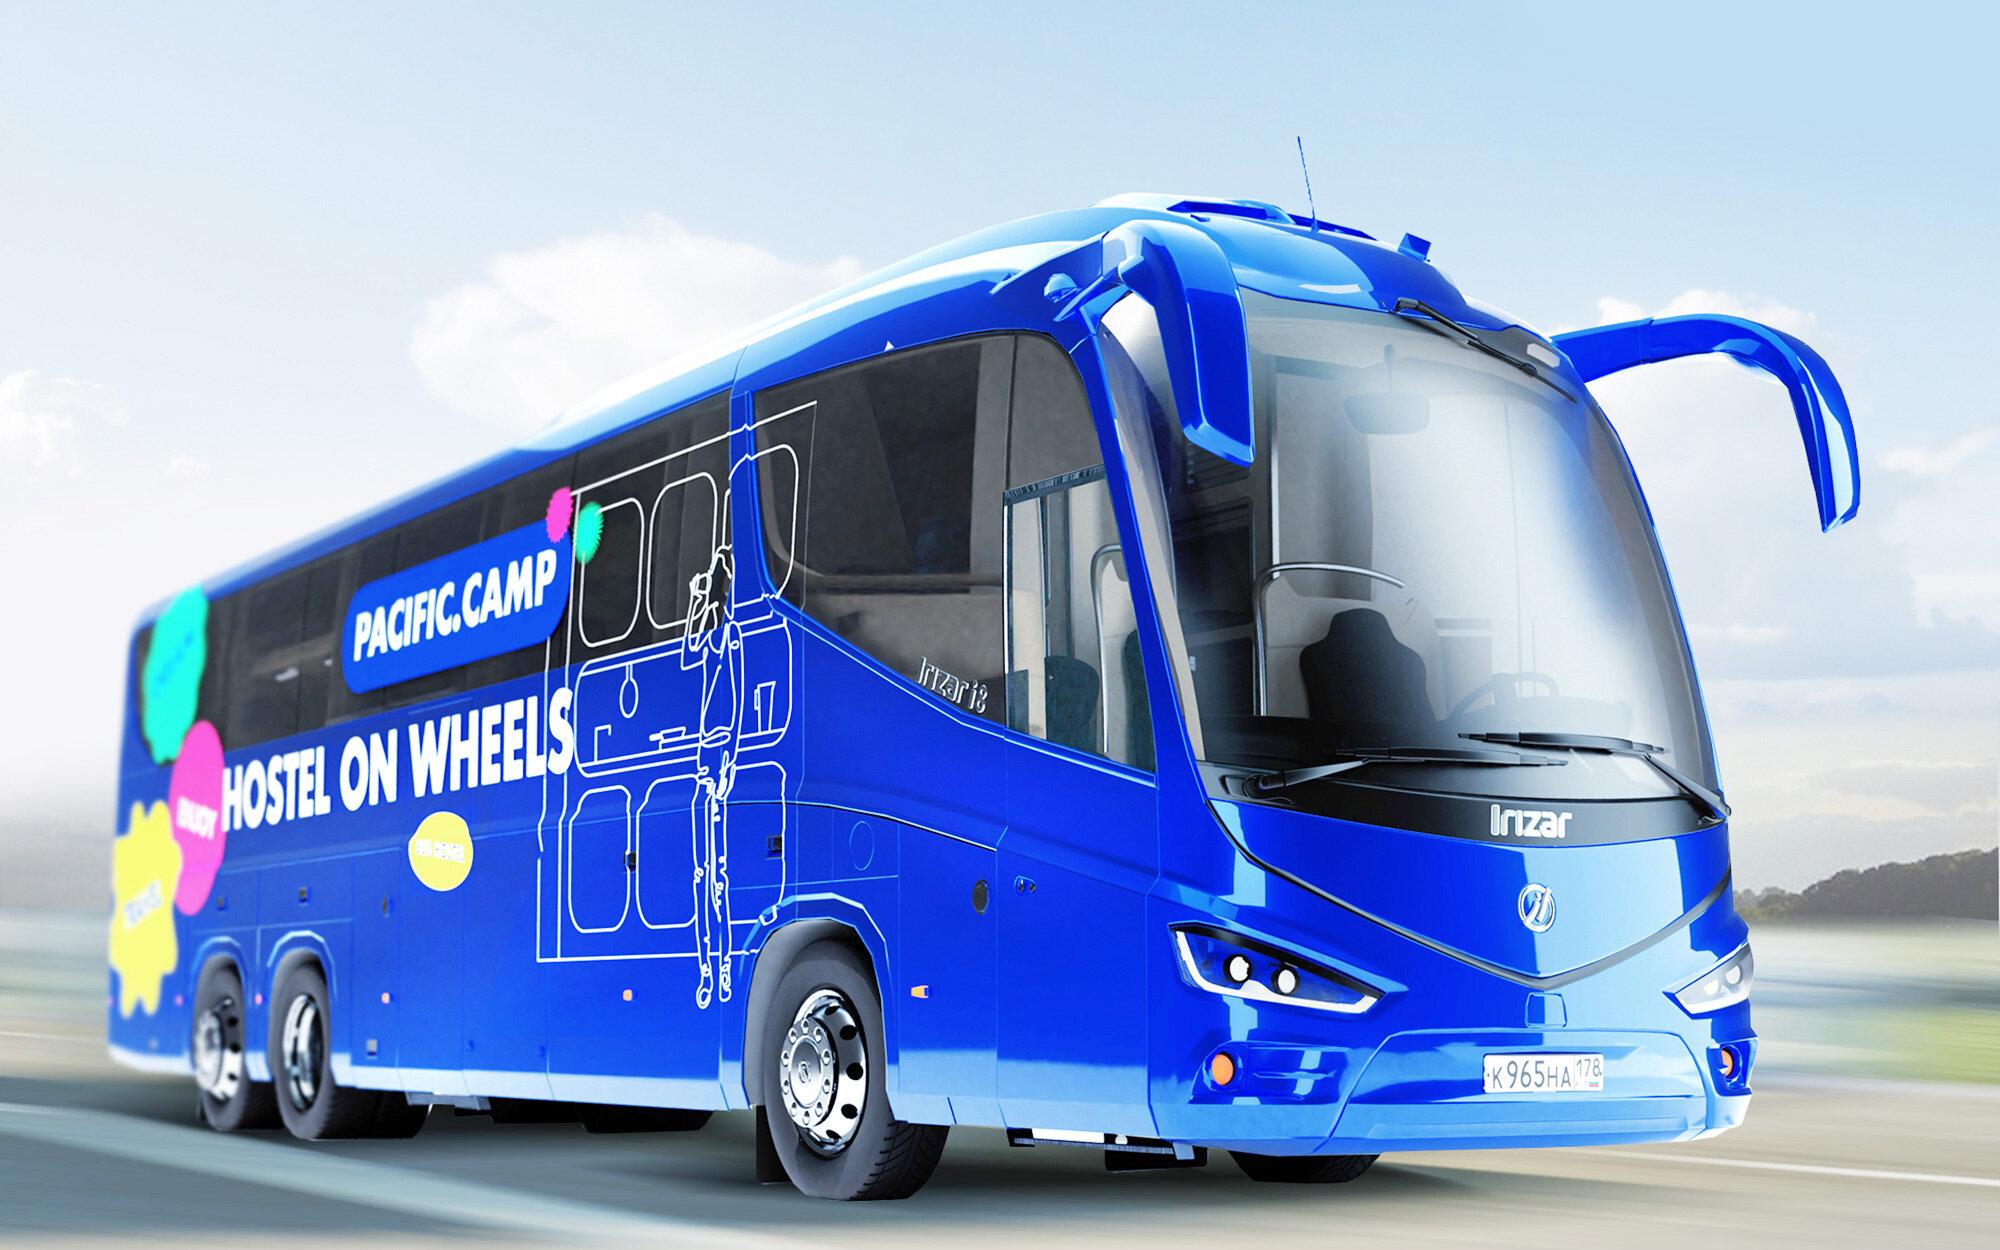 Агентство BQB разработало корпоративный бренд для компании-оператора междугородних автобусов-хостелов